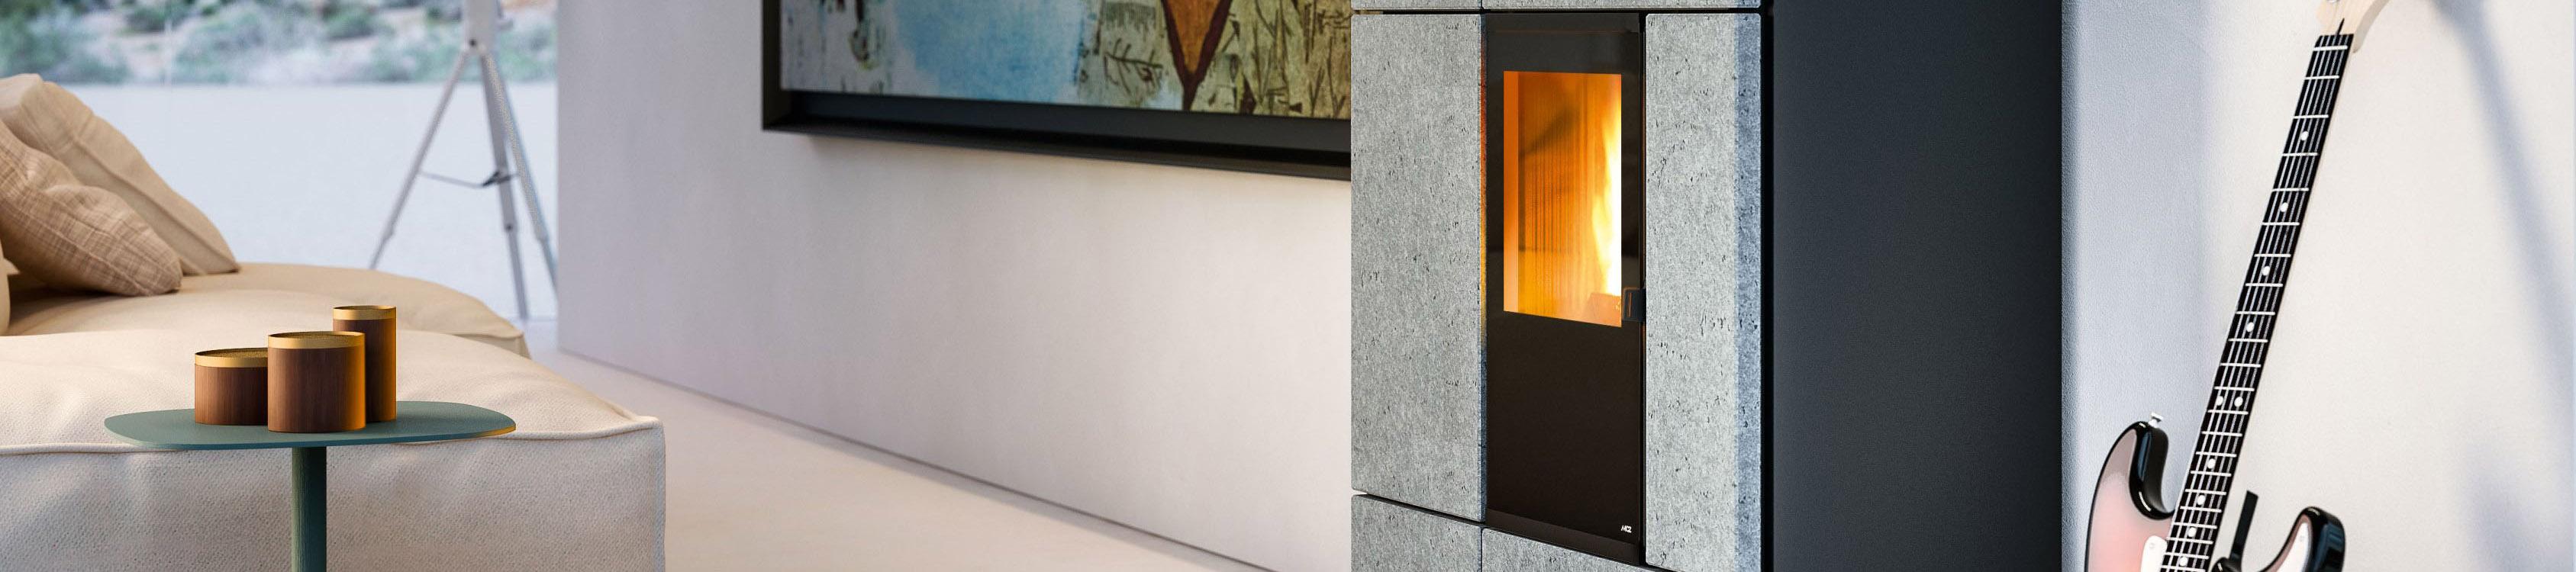 cheminee jouvin. Black Bedroom Furniture Sets. Home Design Ideas